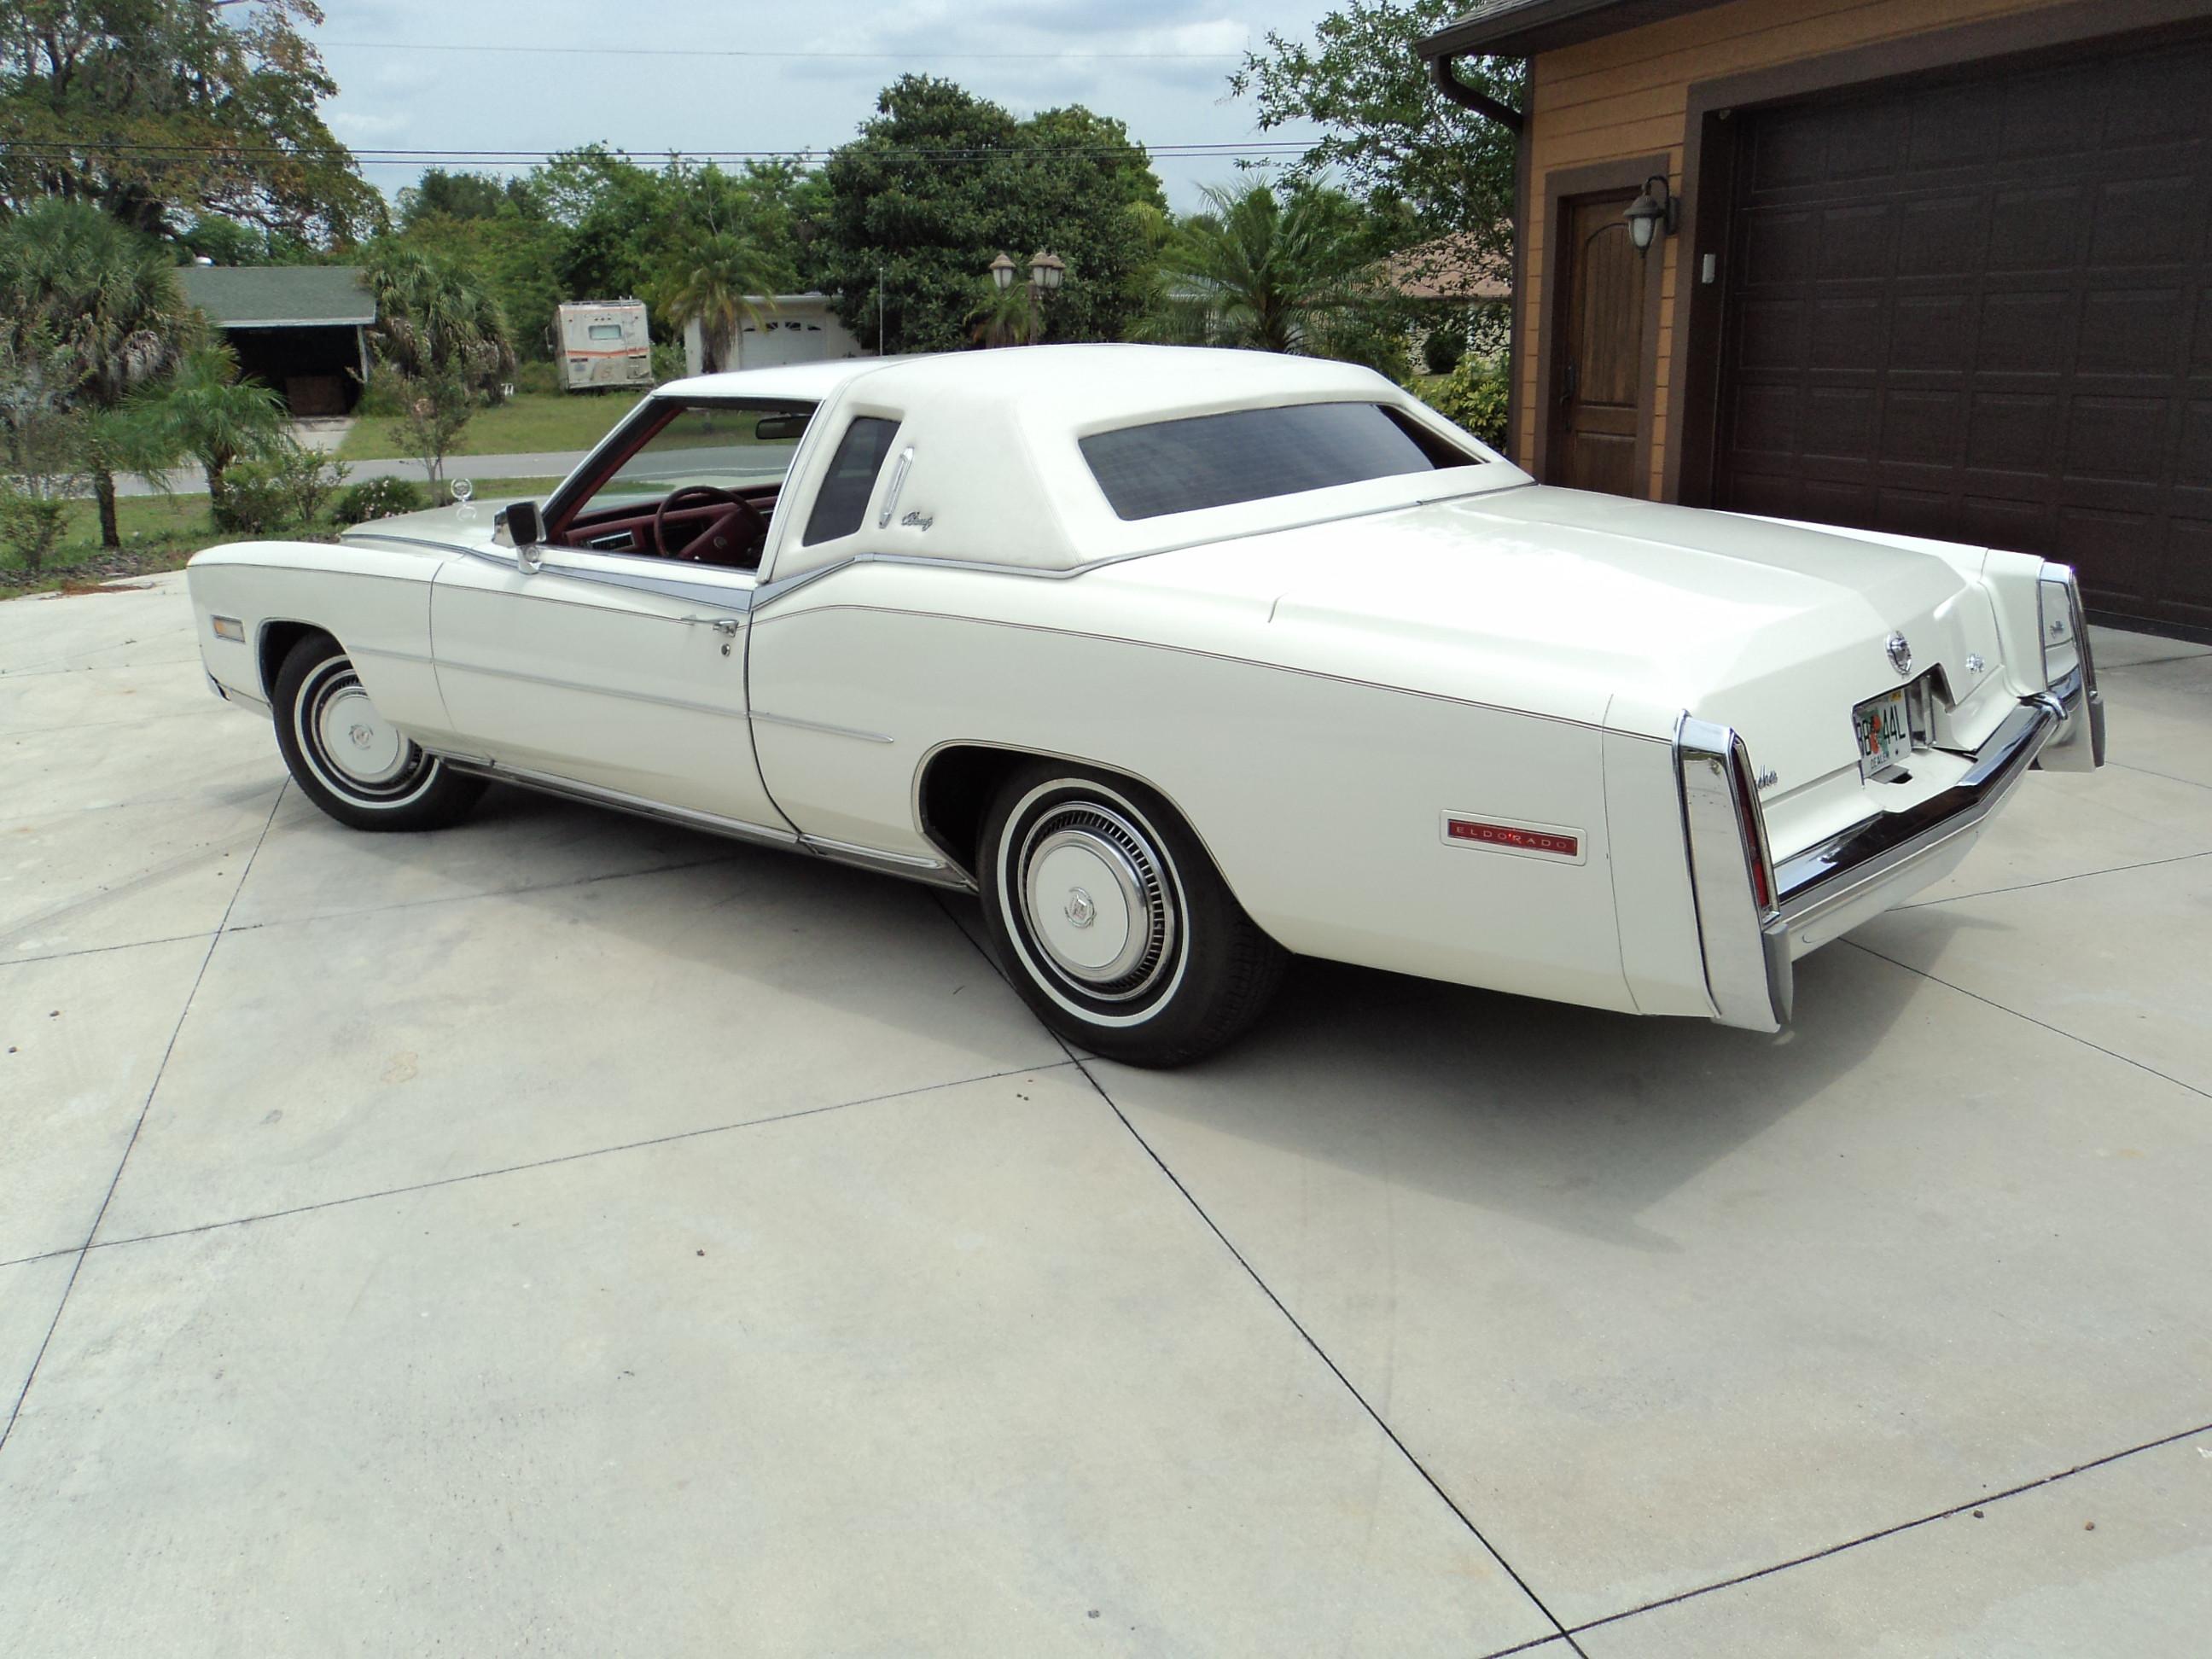 File:1978 Cadillac Eldorado Biarritz.png - Wikimedia Commons